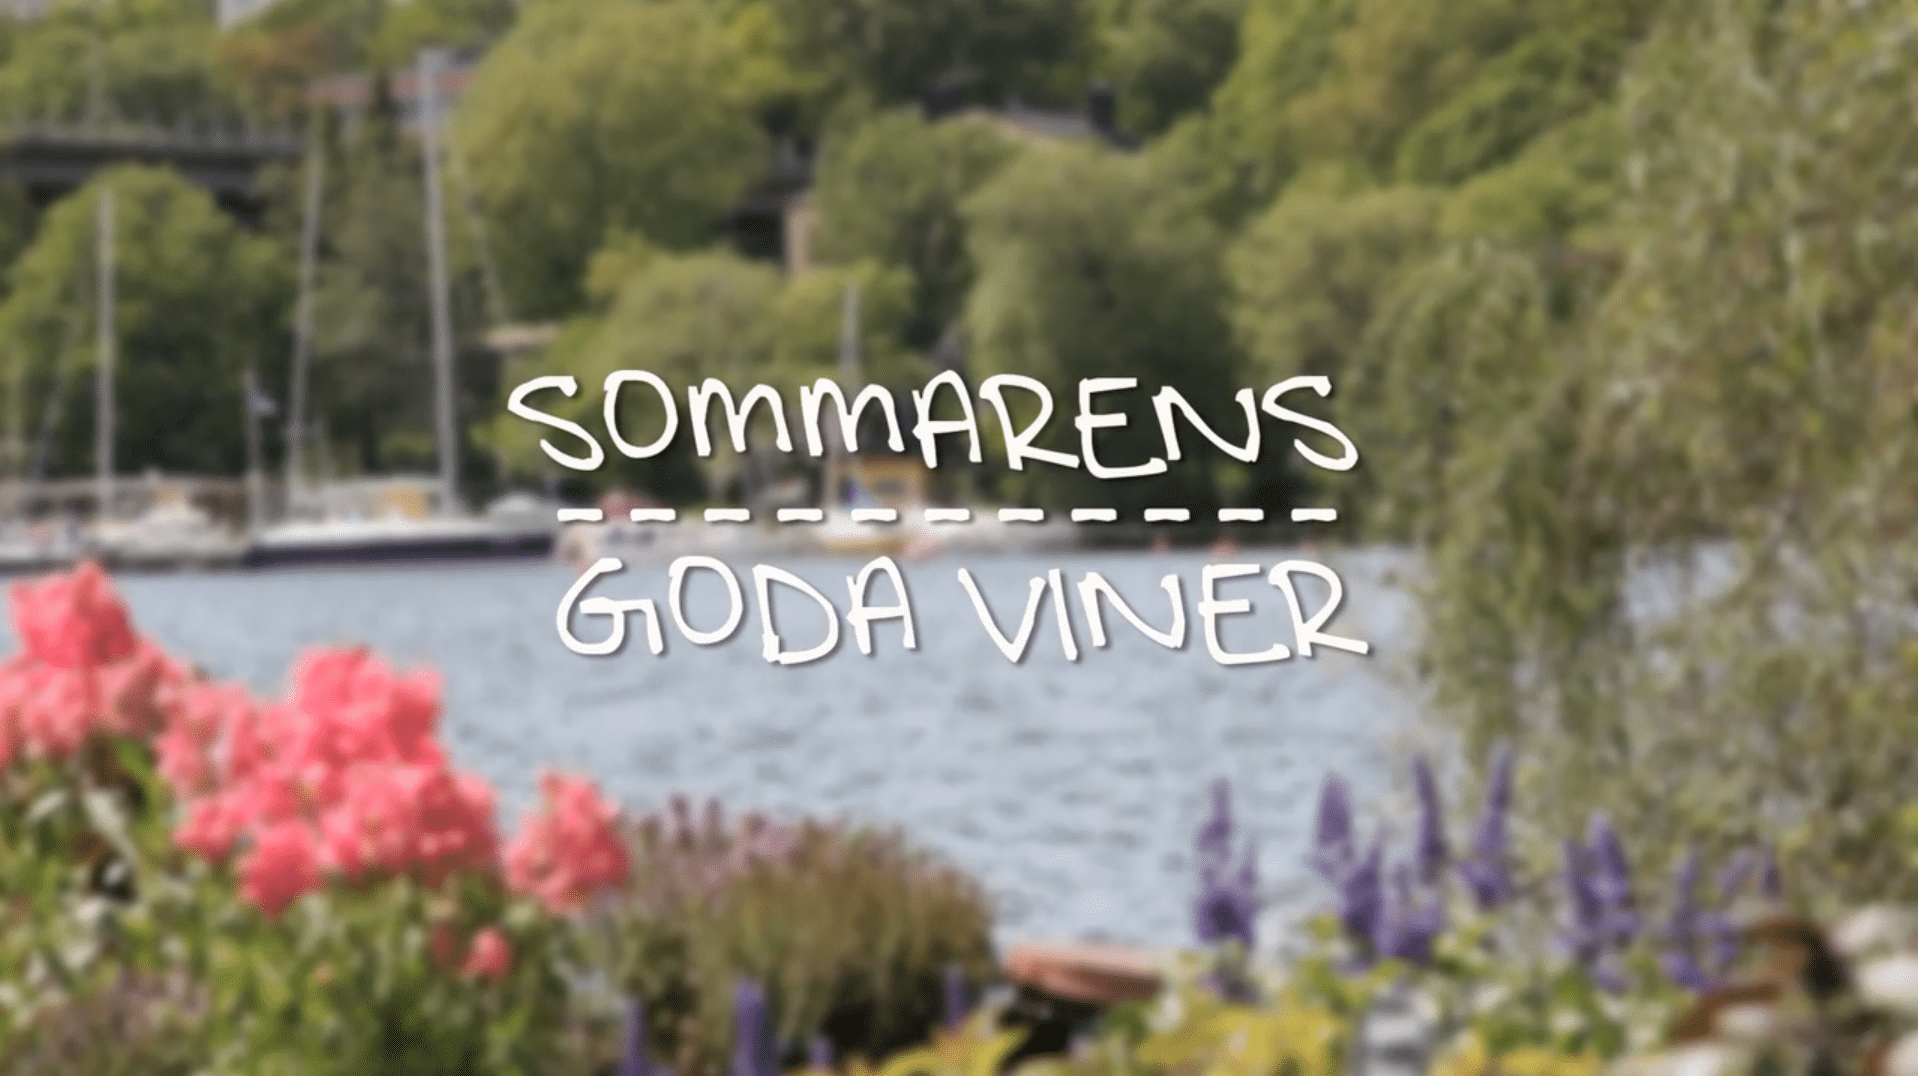 Sommarens Goda Viner – Episod 4: Röda viner